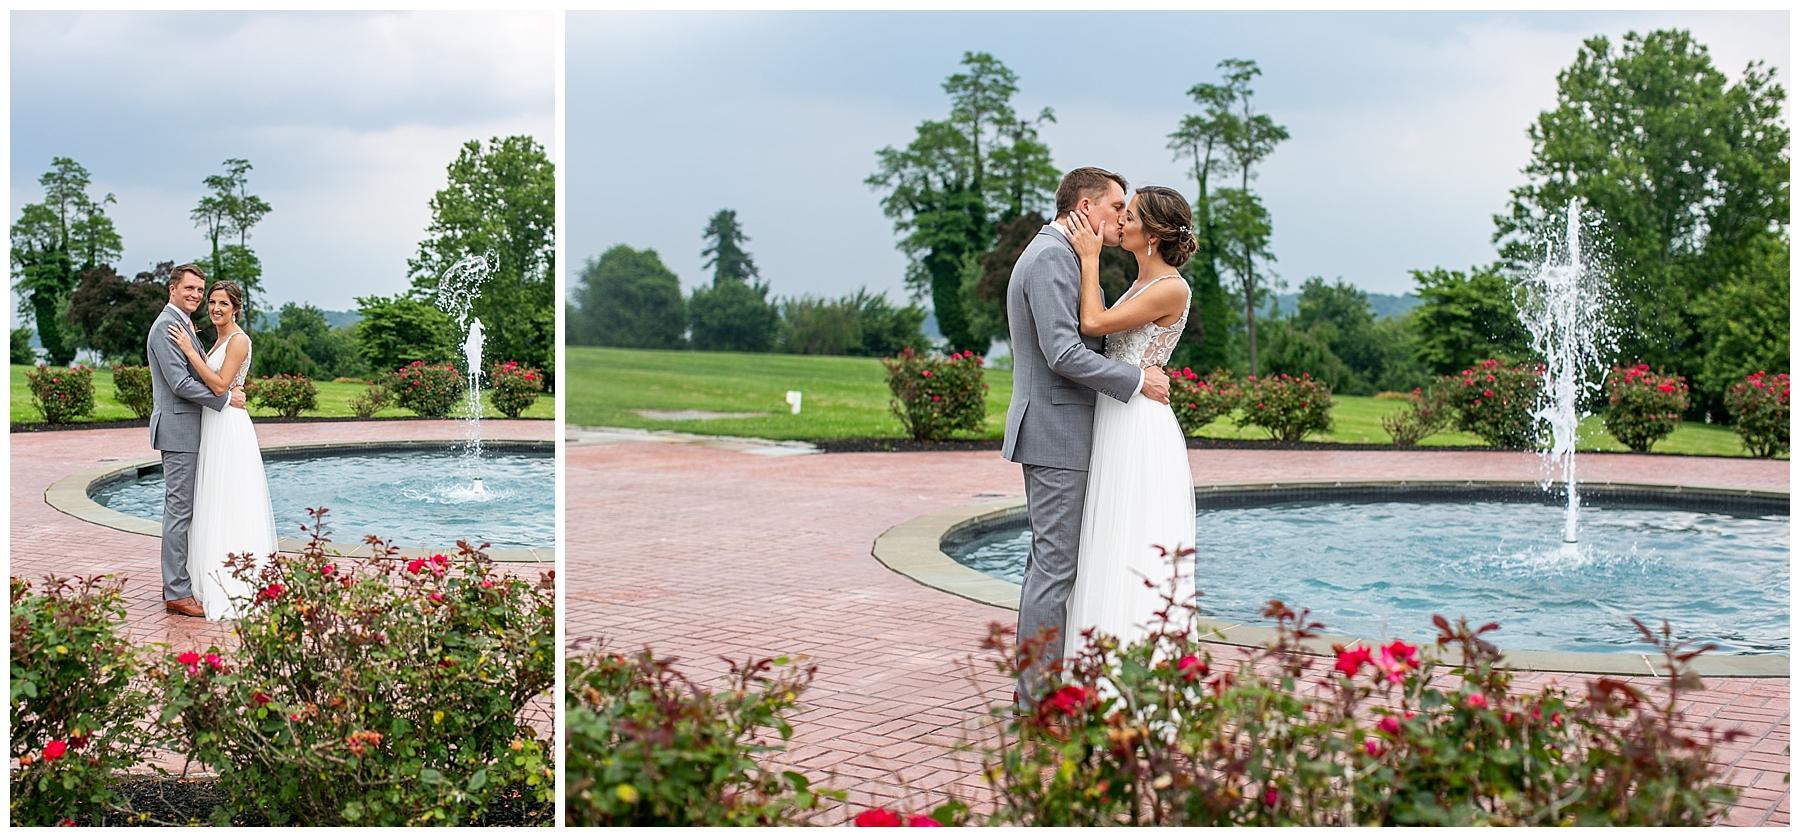 Chelsea Phil Bohemia River Overlook Wedding Living Radiant Photography photos_0051.jpg